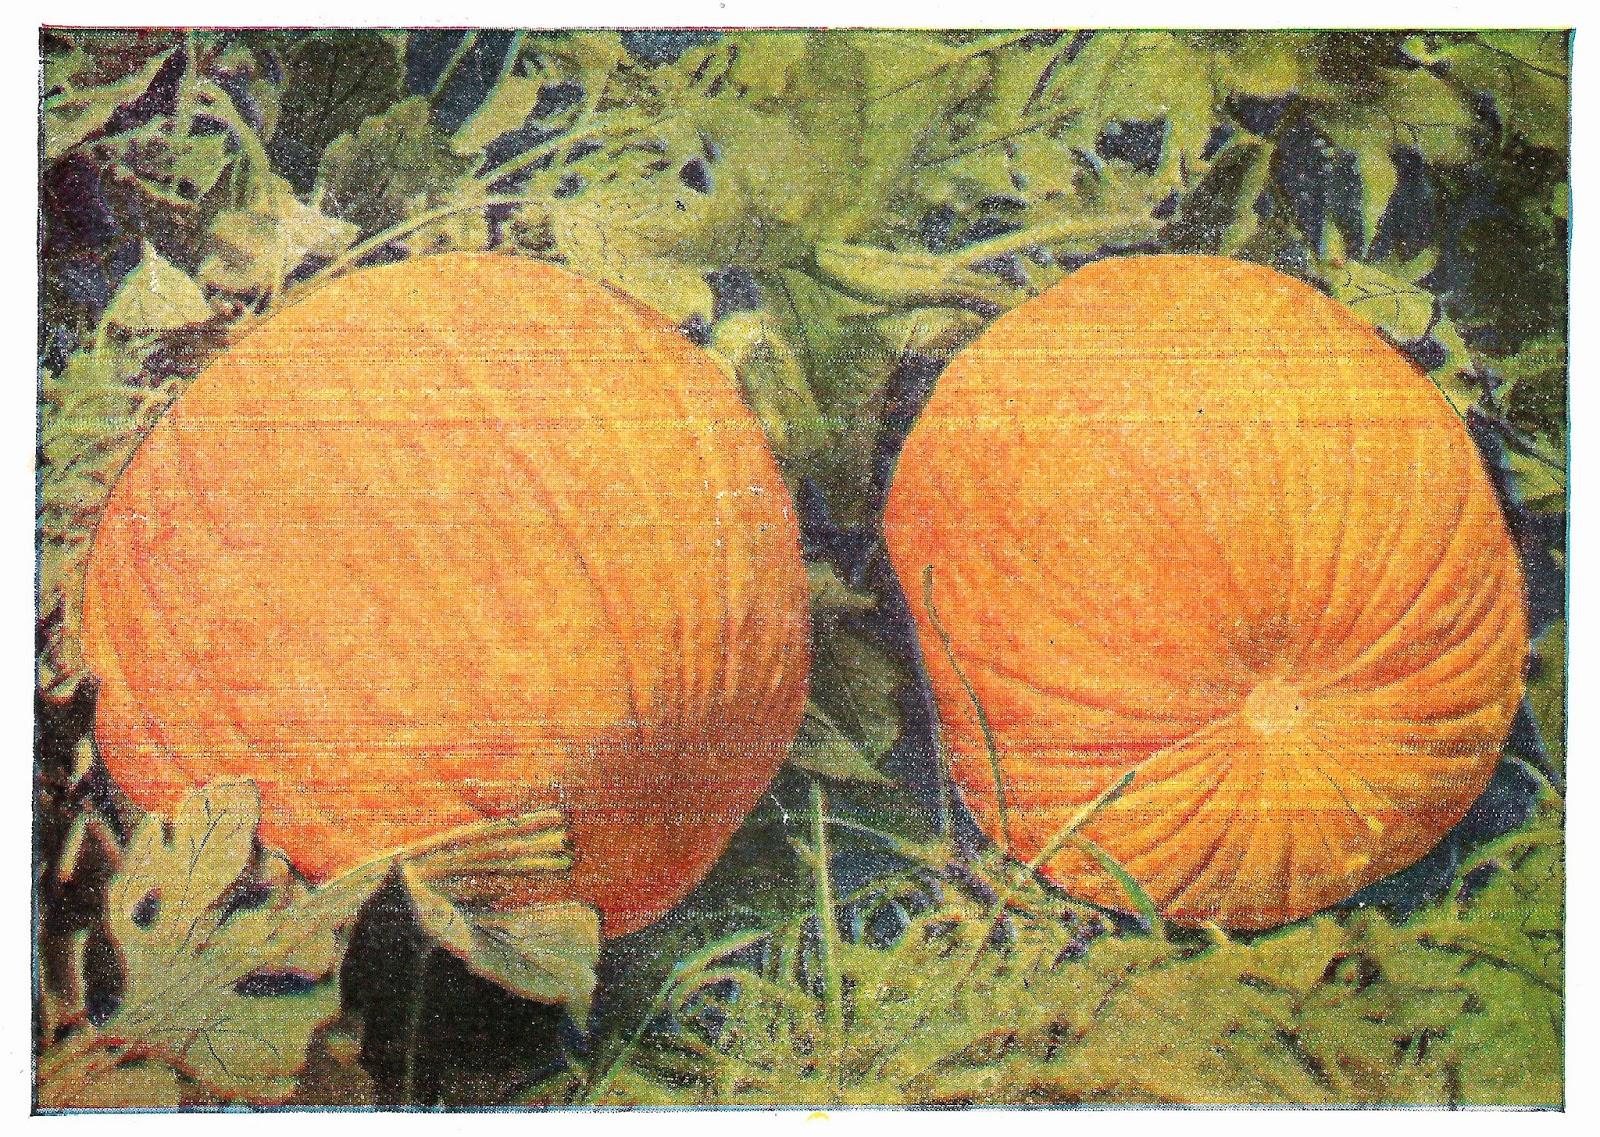 Antique Images: Free Food Clip Art: Vintage Photo of 2 ...